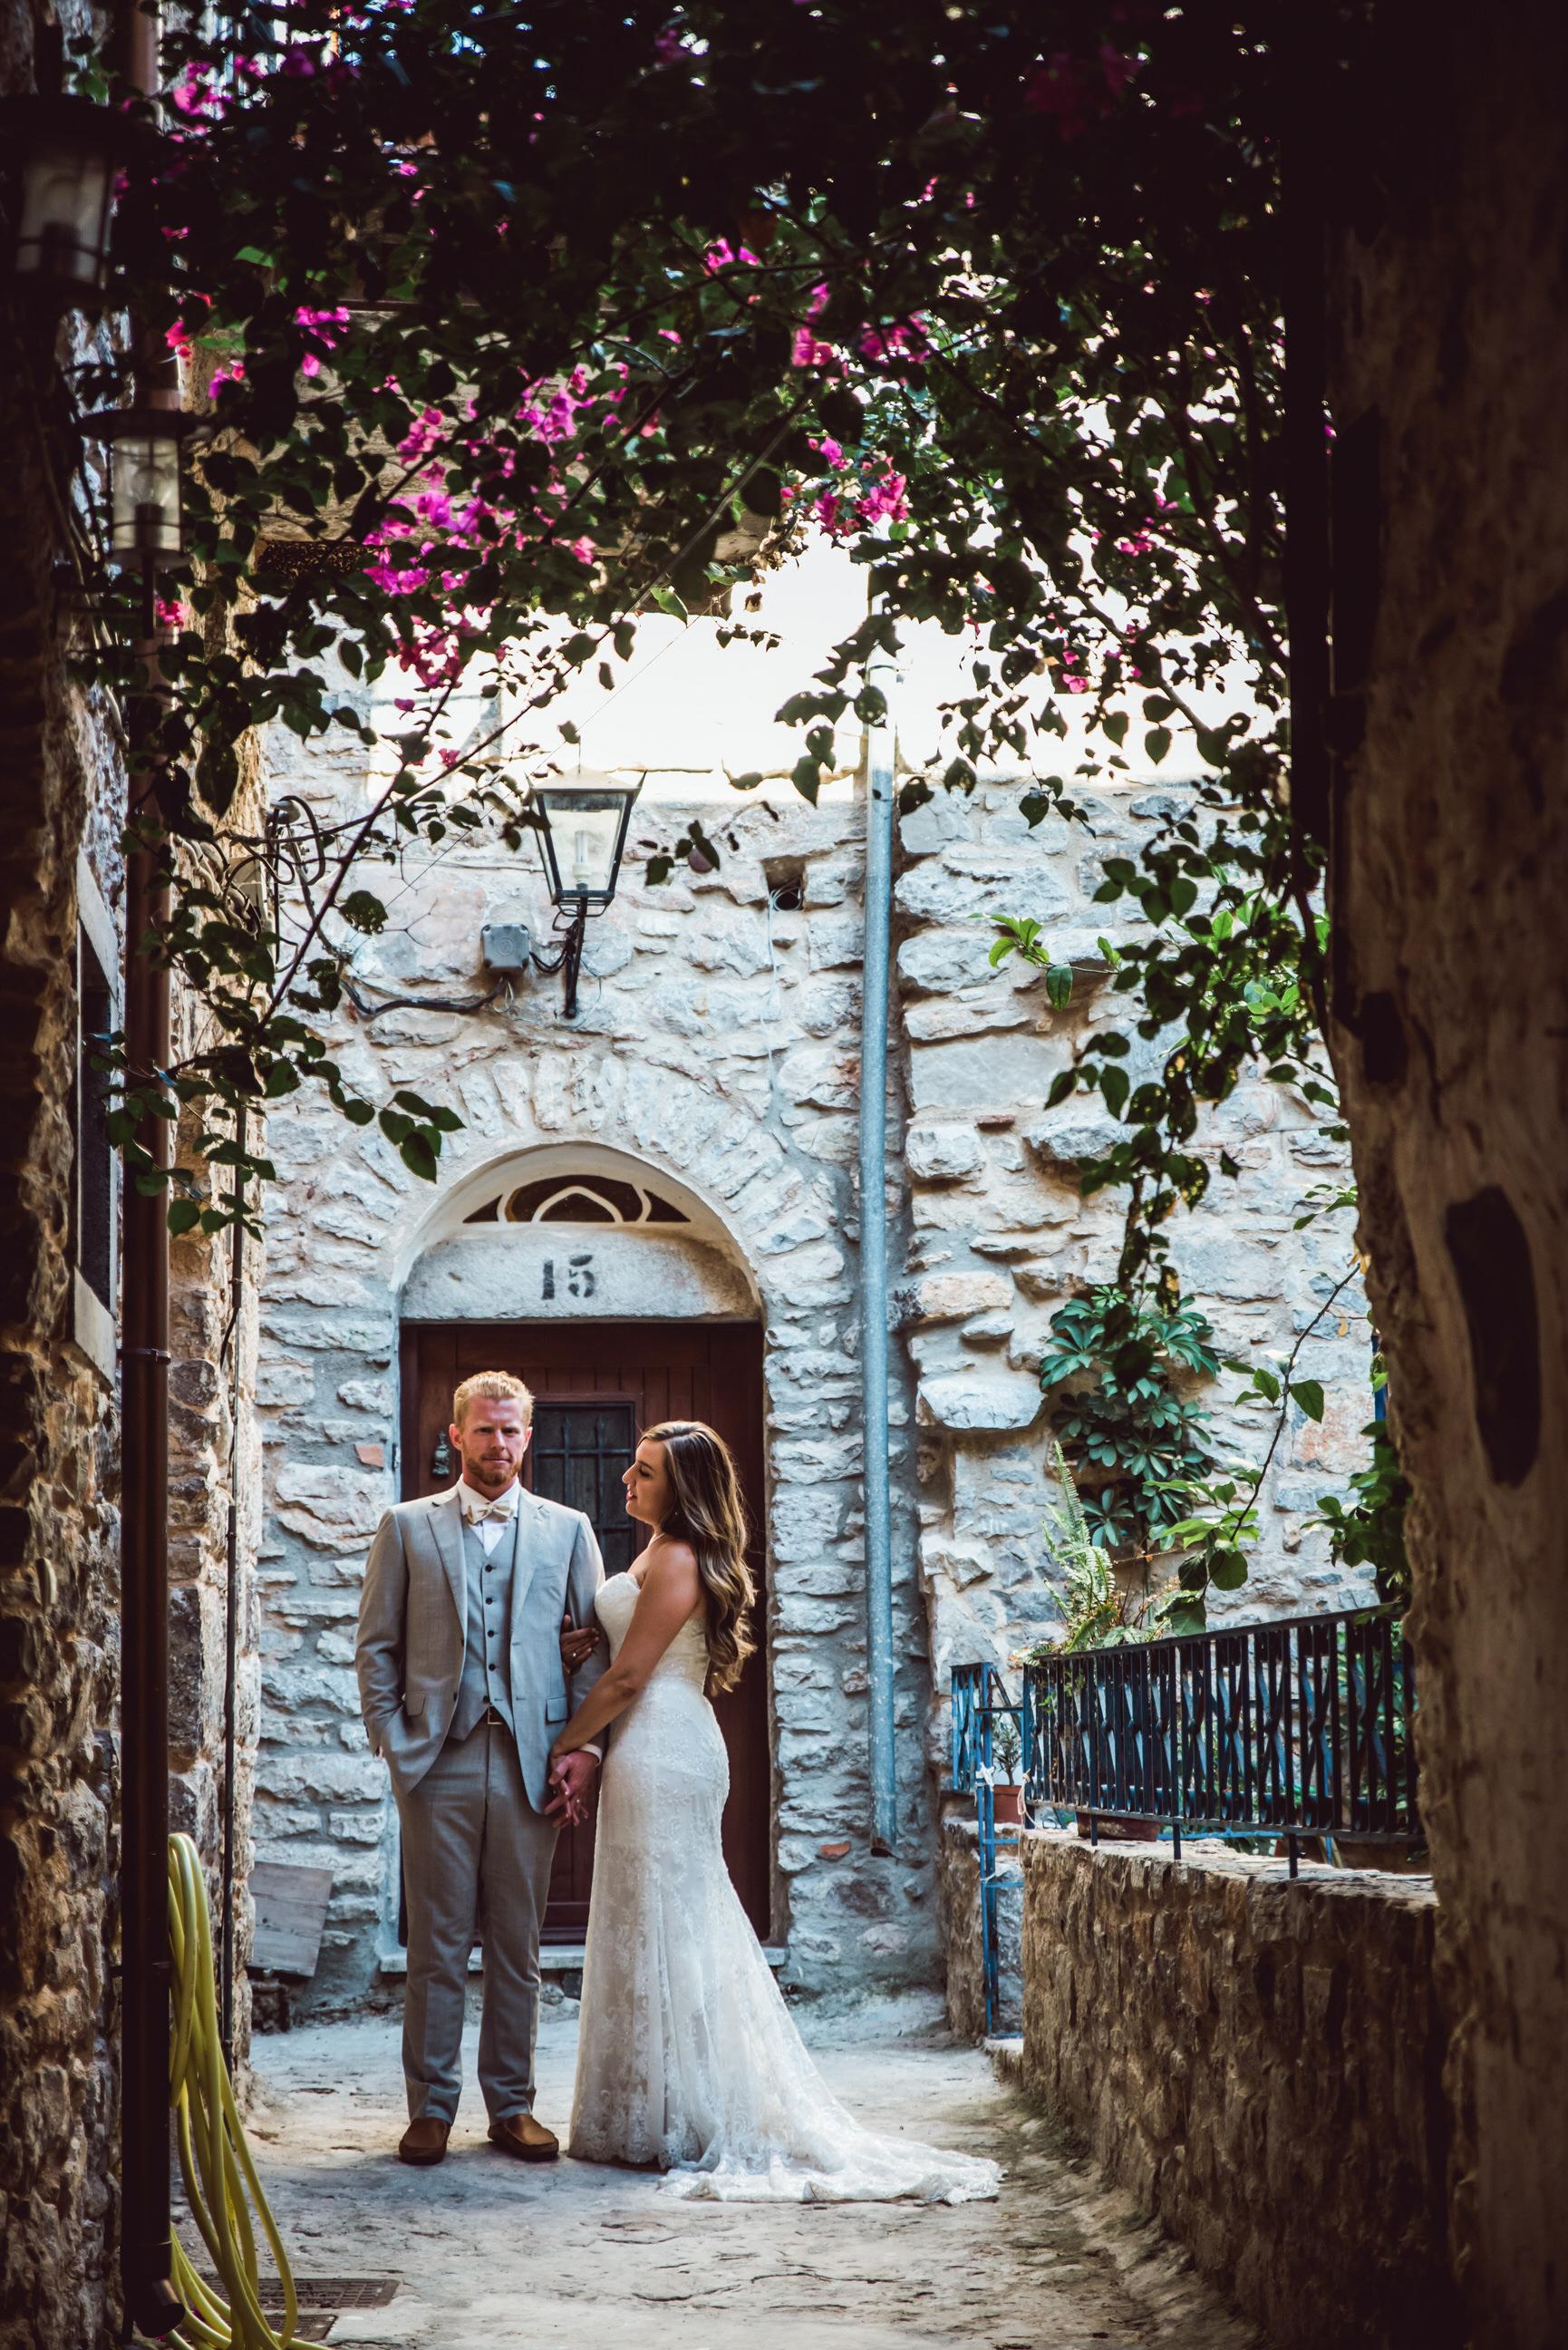 GreeceWedding-Tricia&Will-DayAfter-118.jpg